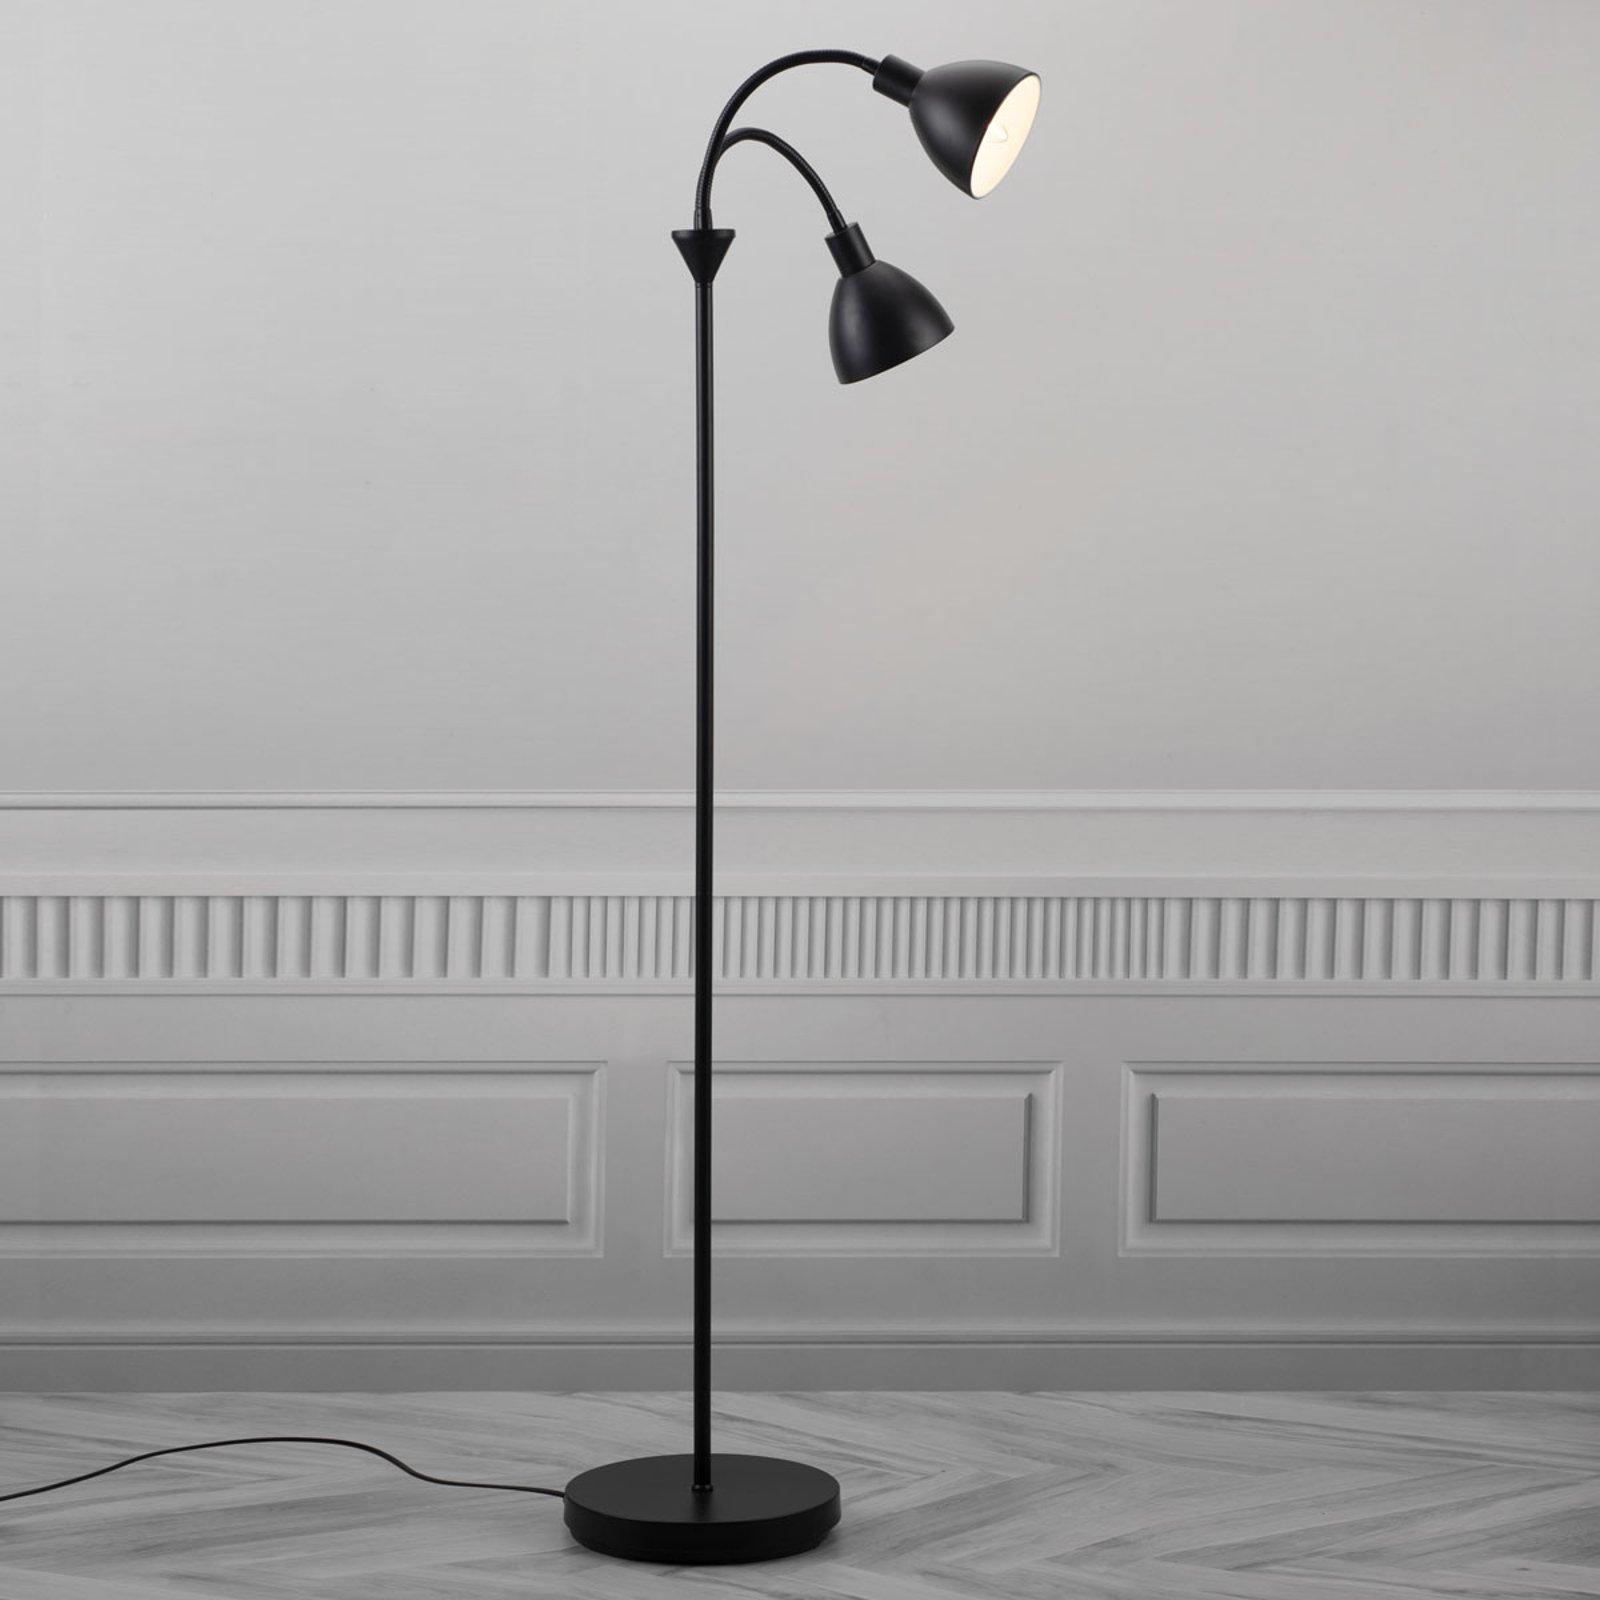 Gulvlampe Ray i svart metall, 2 lyskilder